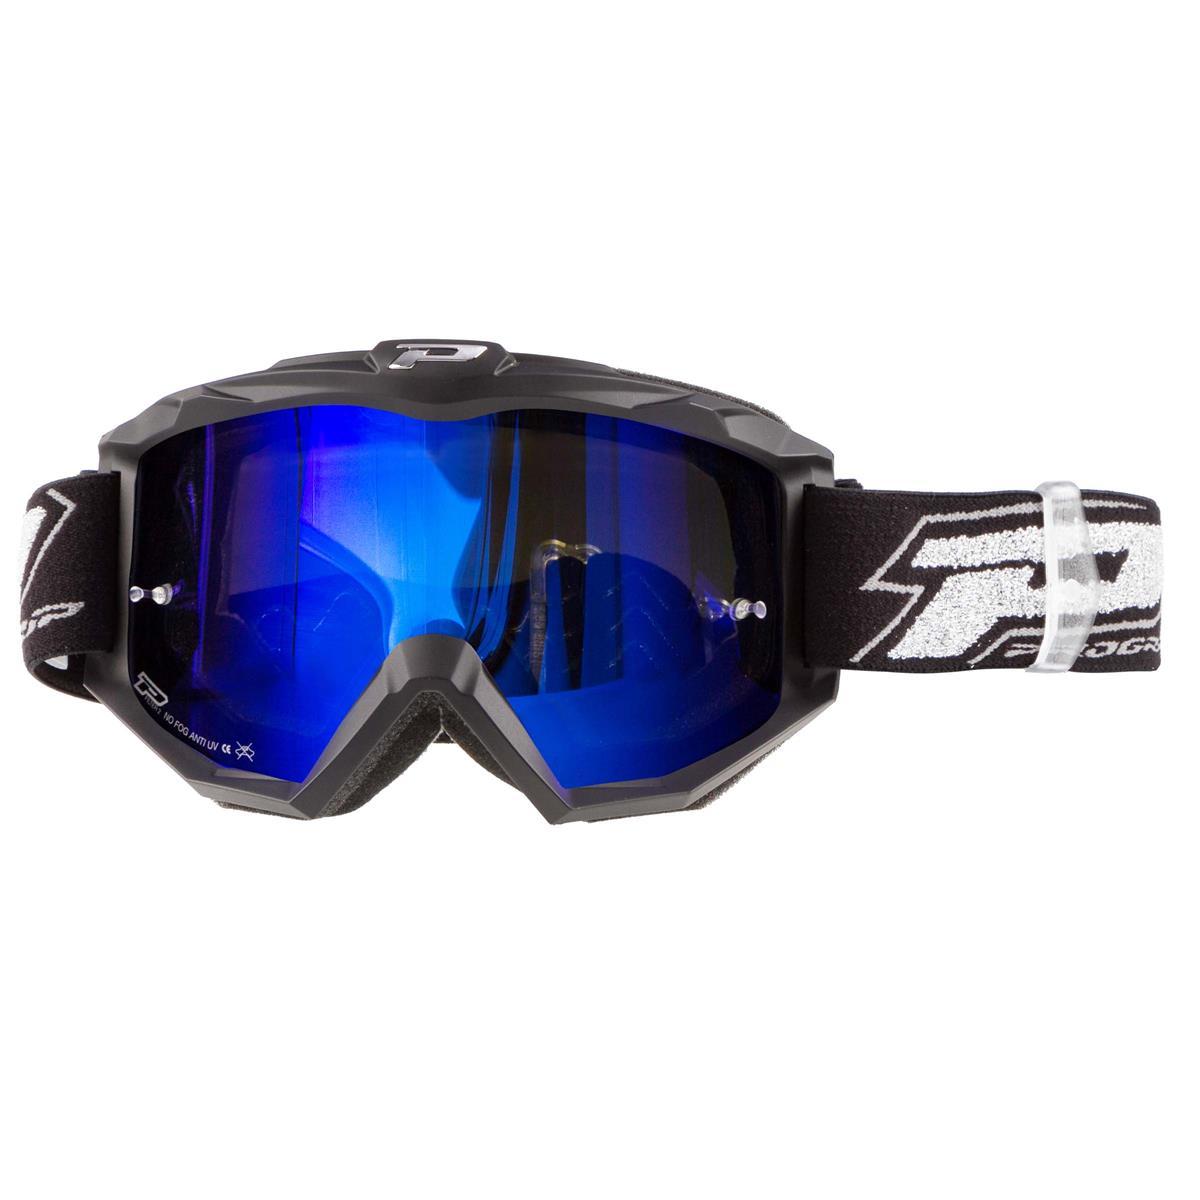 ProGrip Crossbrille 3204 FL Shiny Blau Mirrored